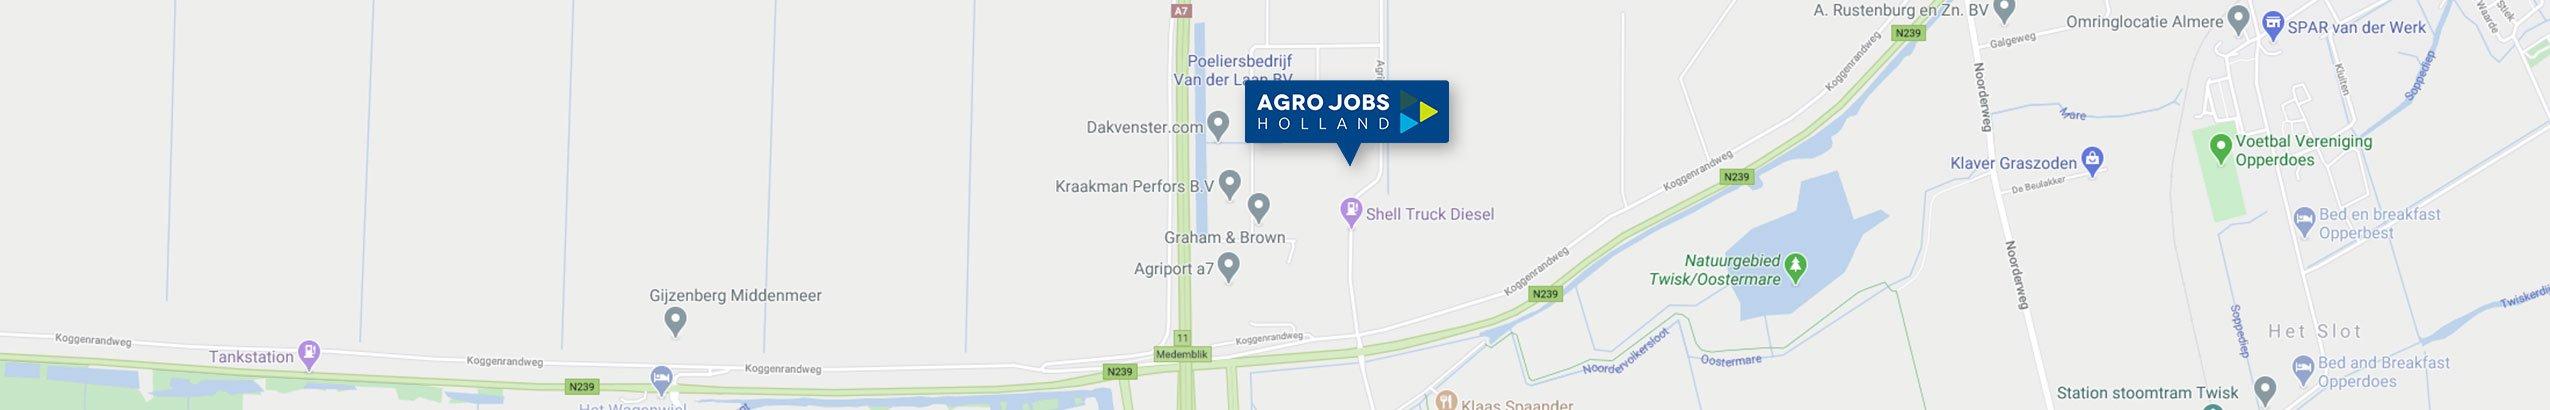 Agro-Jobs-Location